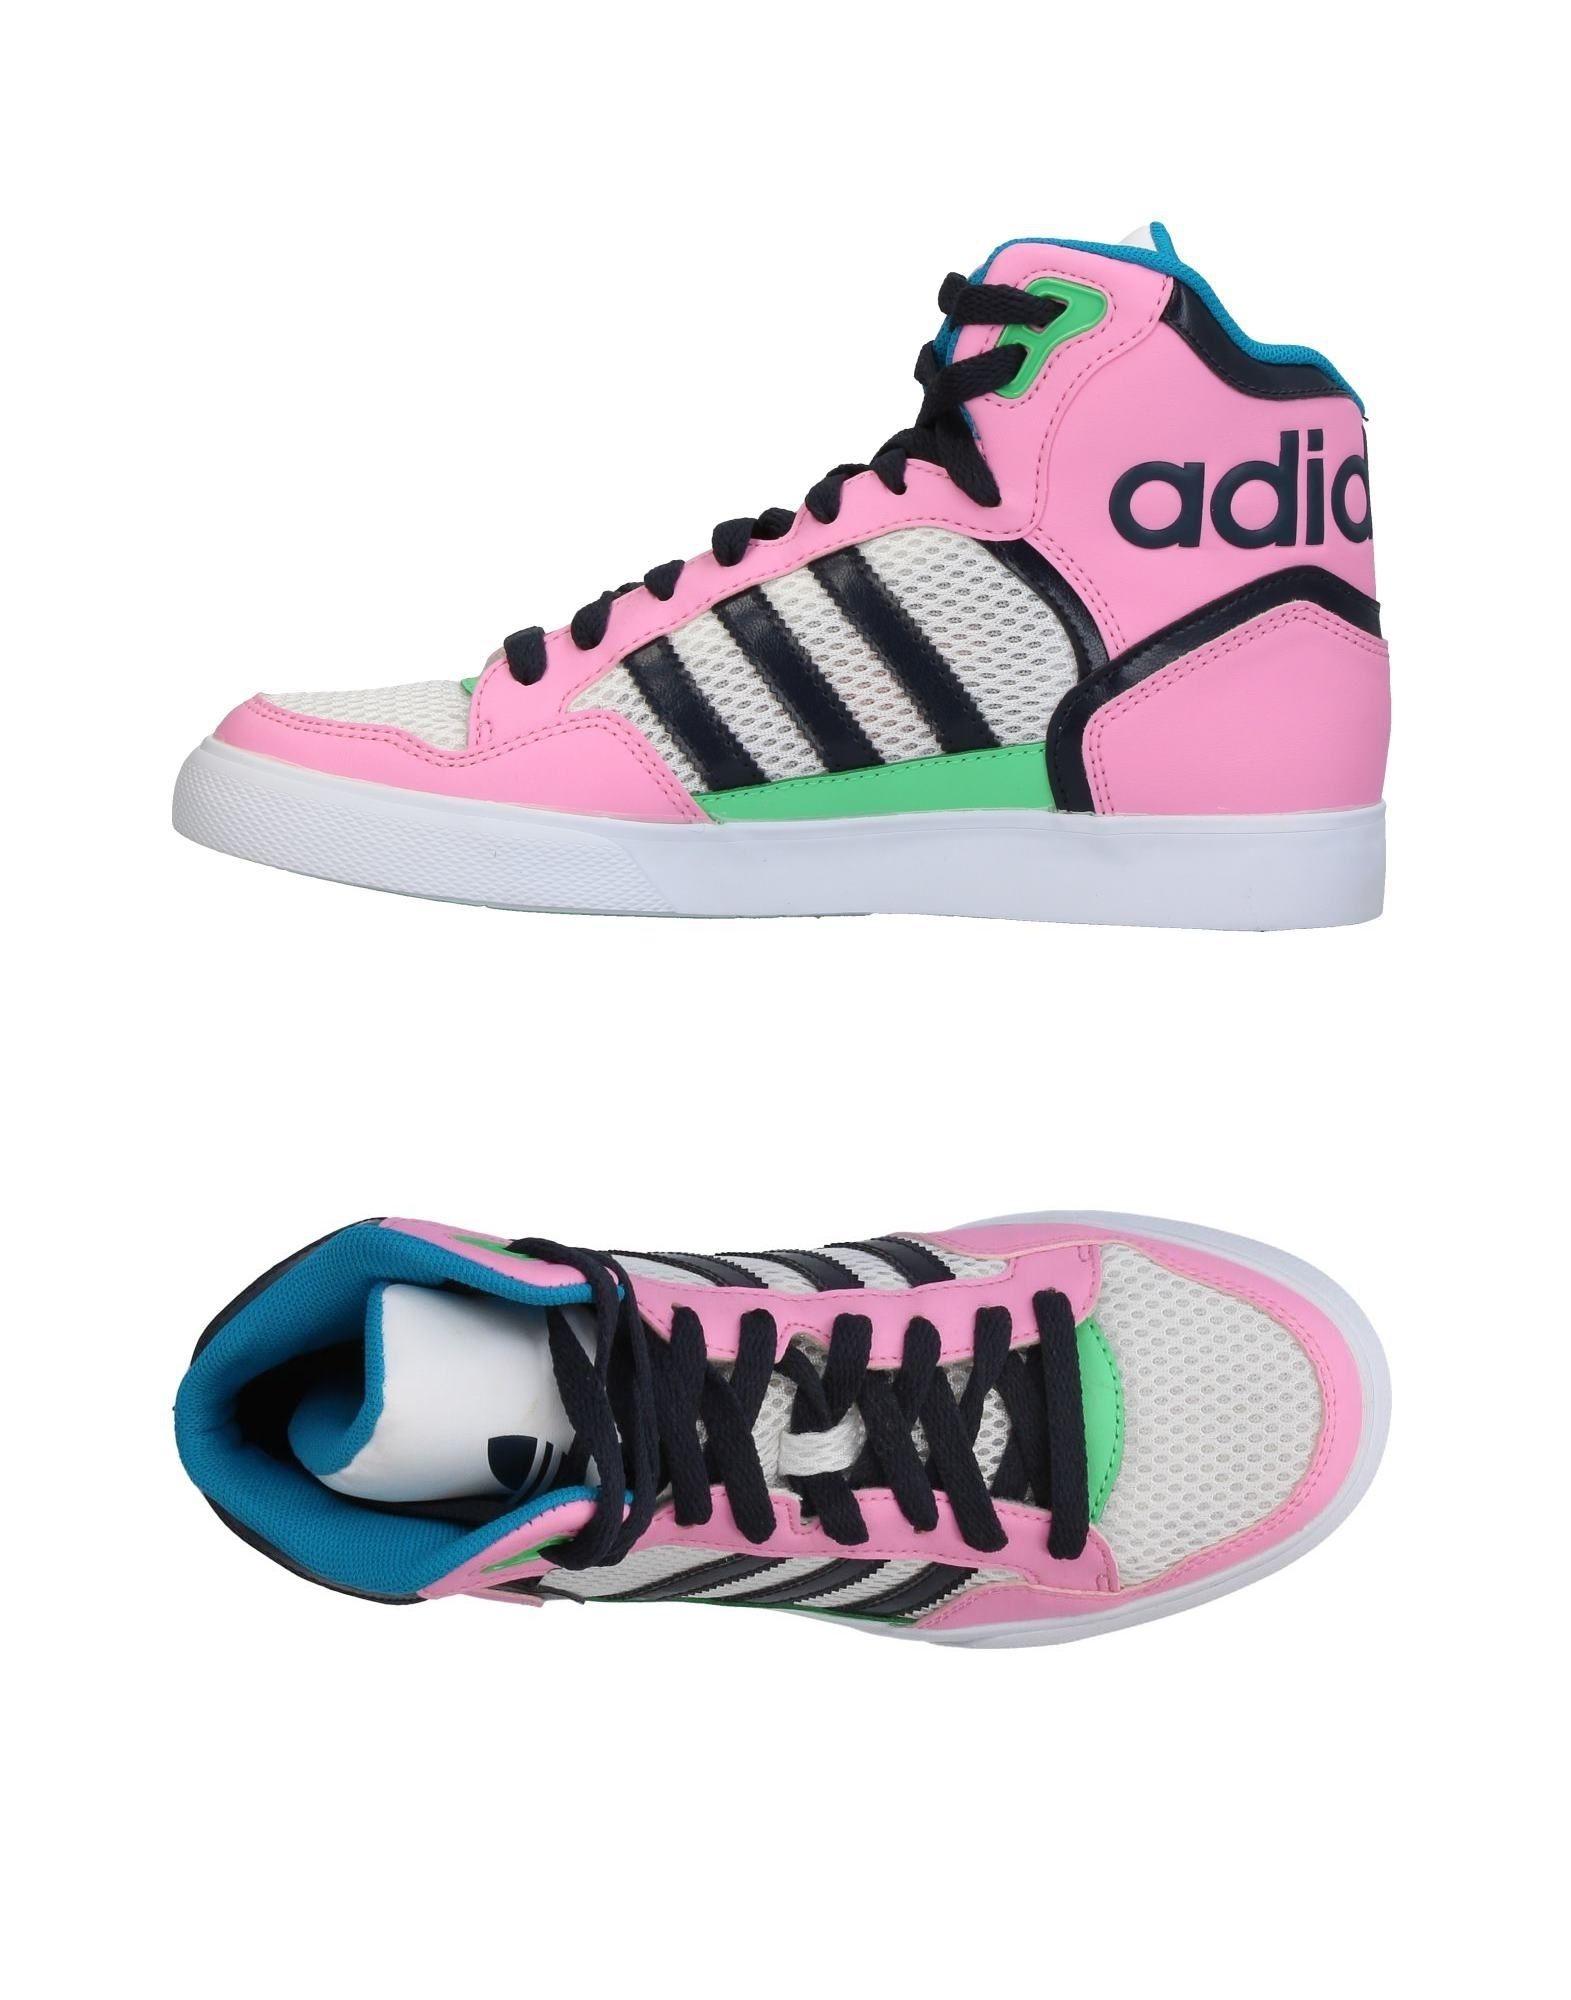 Scarpe da Ginnastica Adidas Originals Donna - 11411125OQ